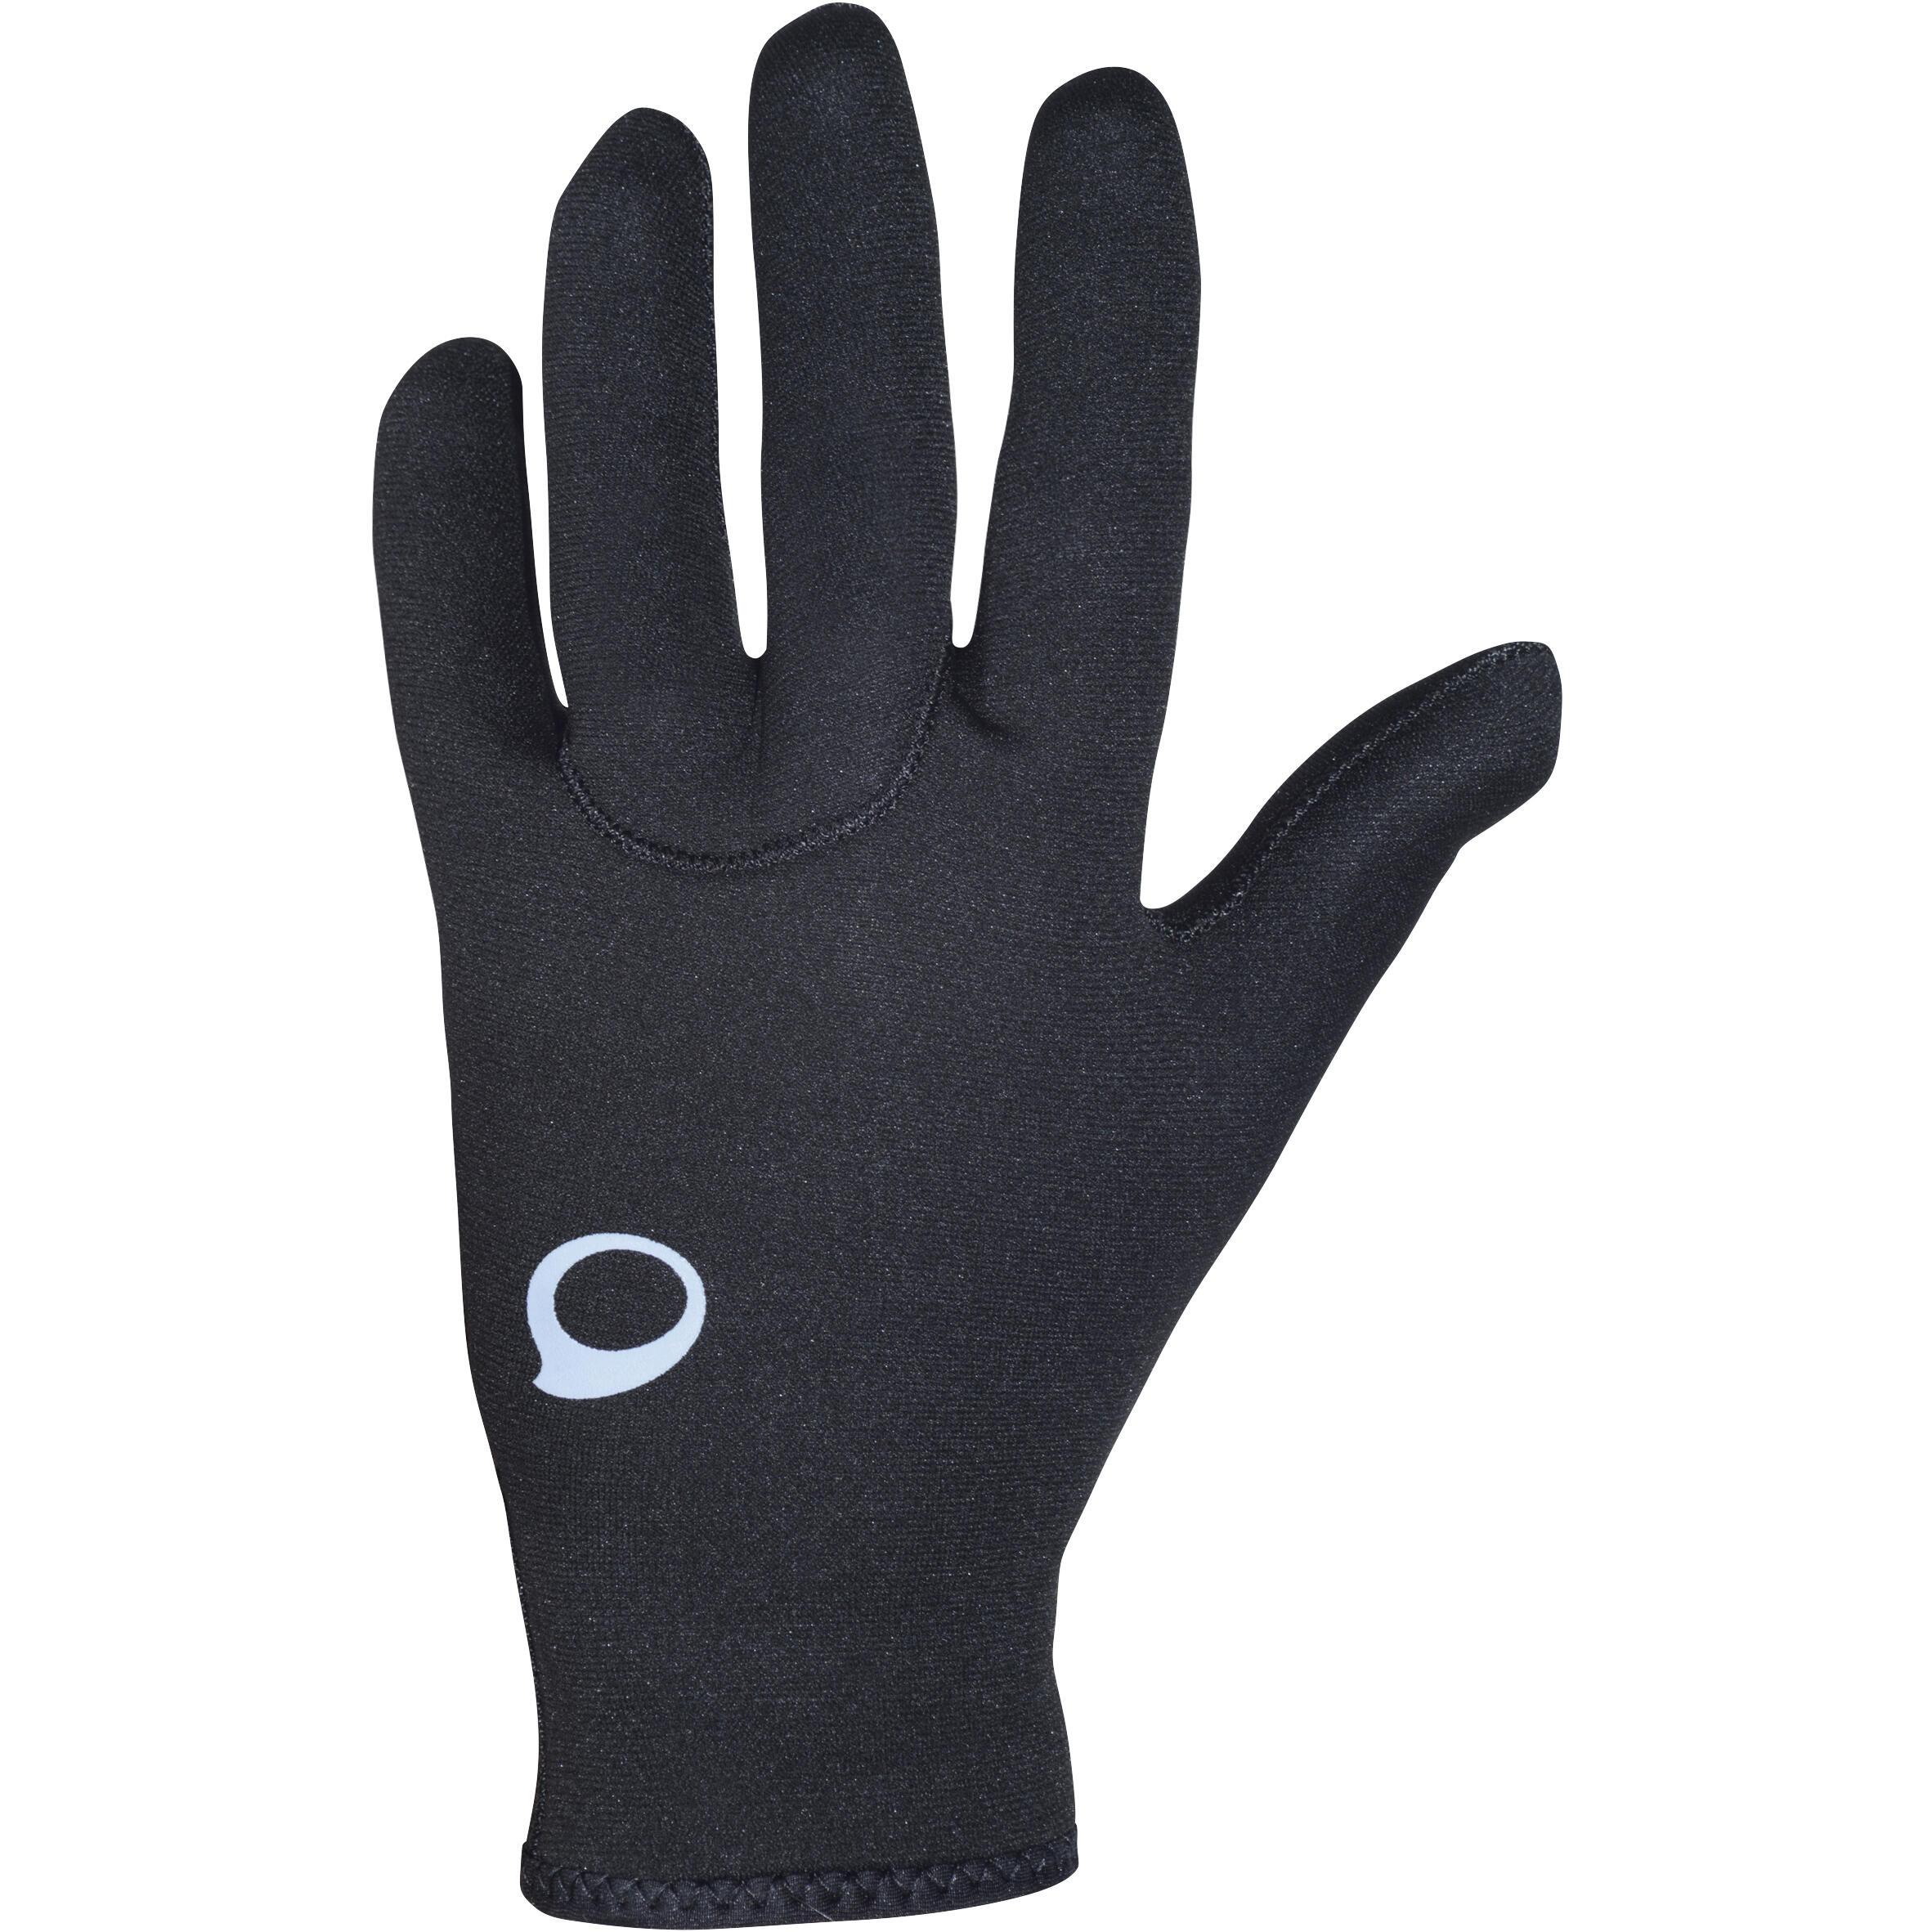 Neoprenhandschuhe Gerätetauchen SCD 2mm | Accessoires > Handschuhe > Sonstige Handschuhe | Subea